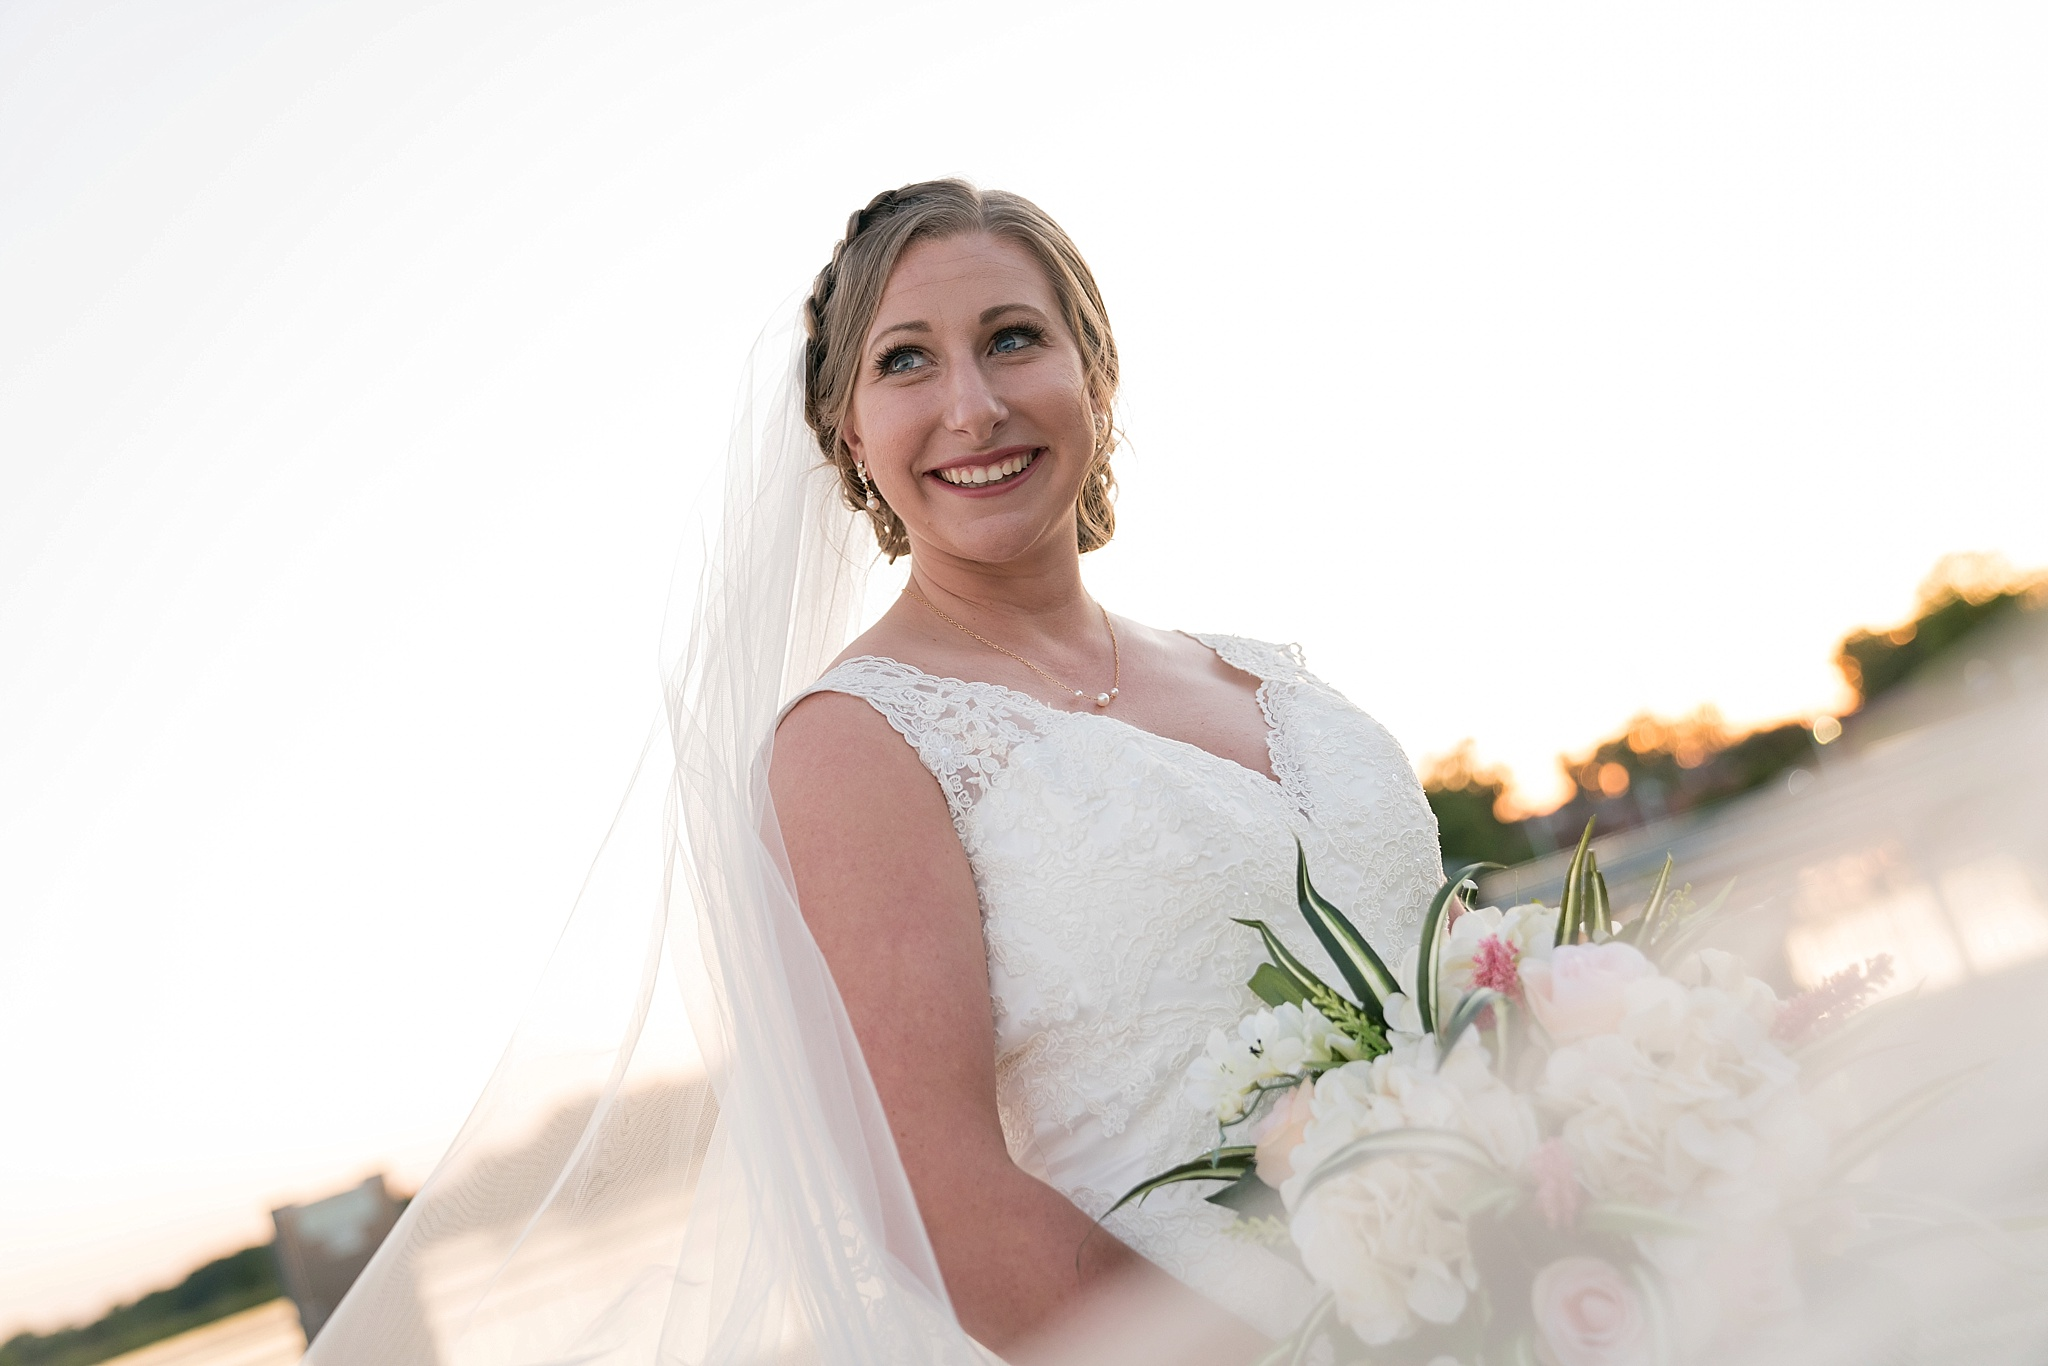 New-Bern-NC-Wedding-Photographer-076.jpg